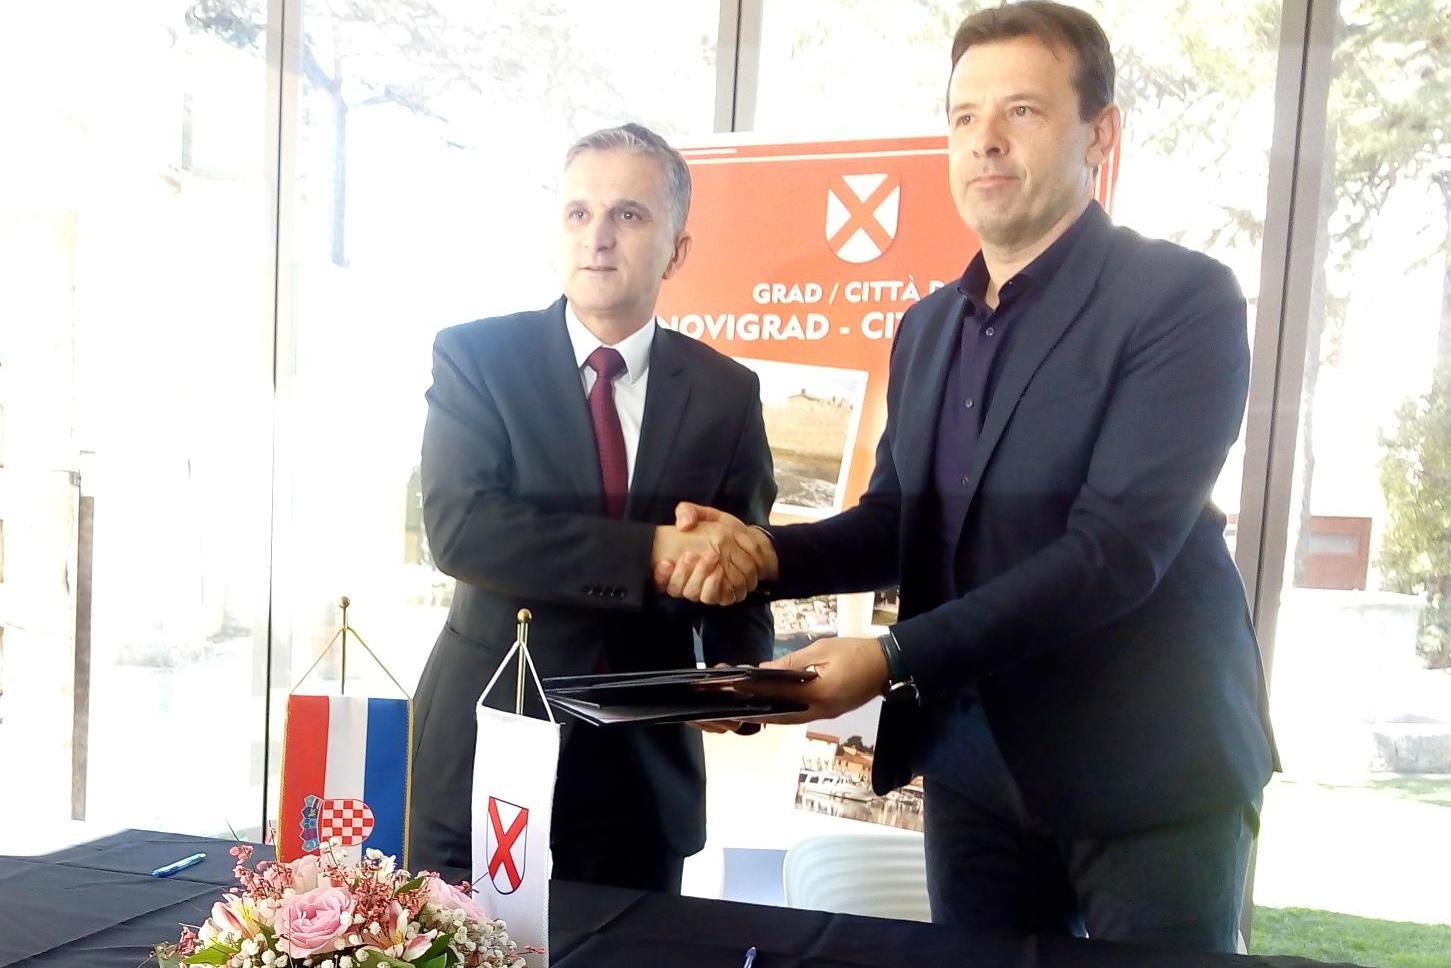 http://www.novigrad.hr/ministar_mari_i_gradonachelnik_milos_potpisali_ugovor_o_darovanju_zemljisht